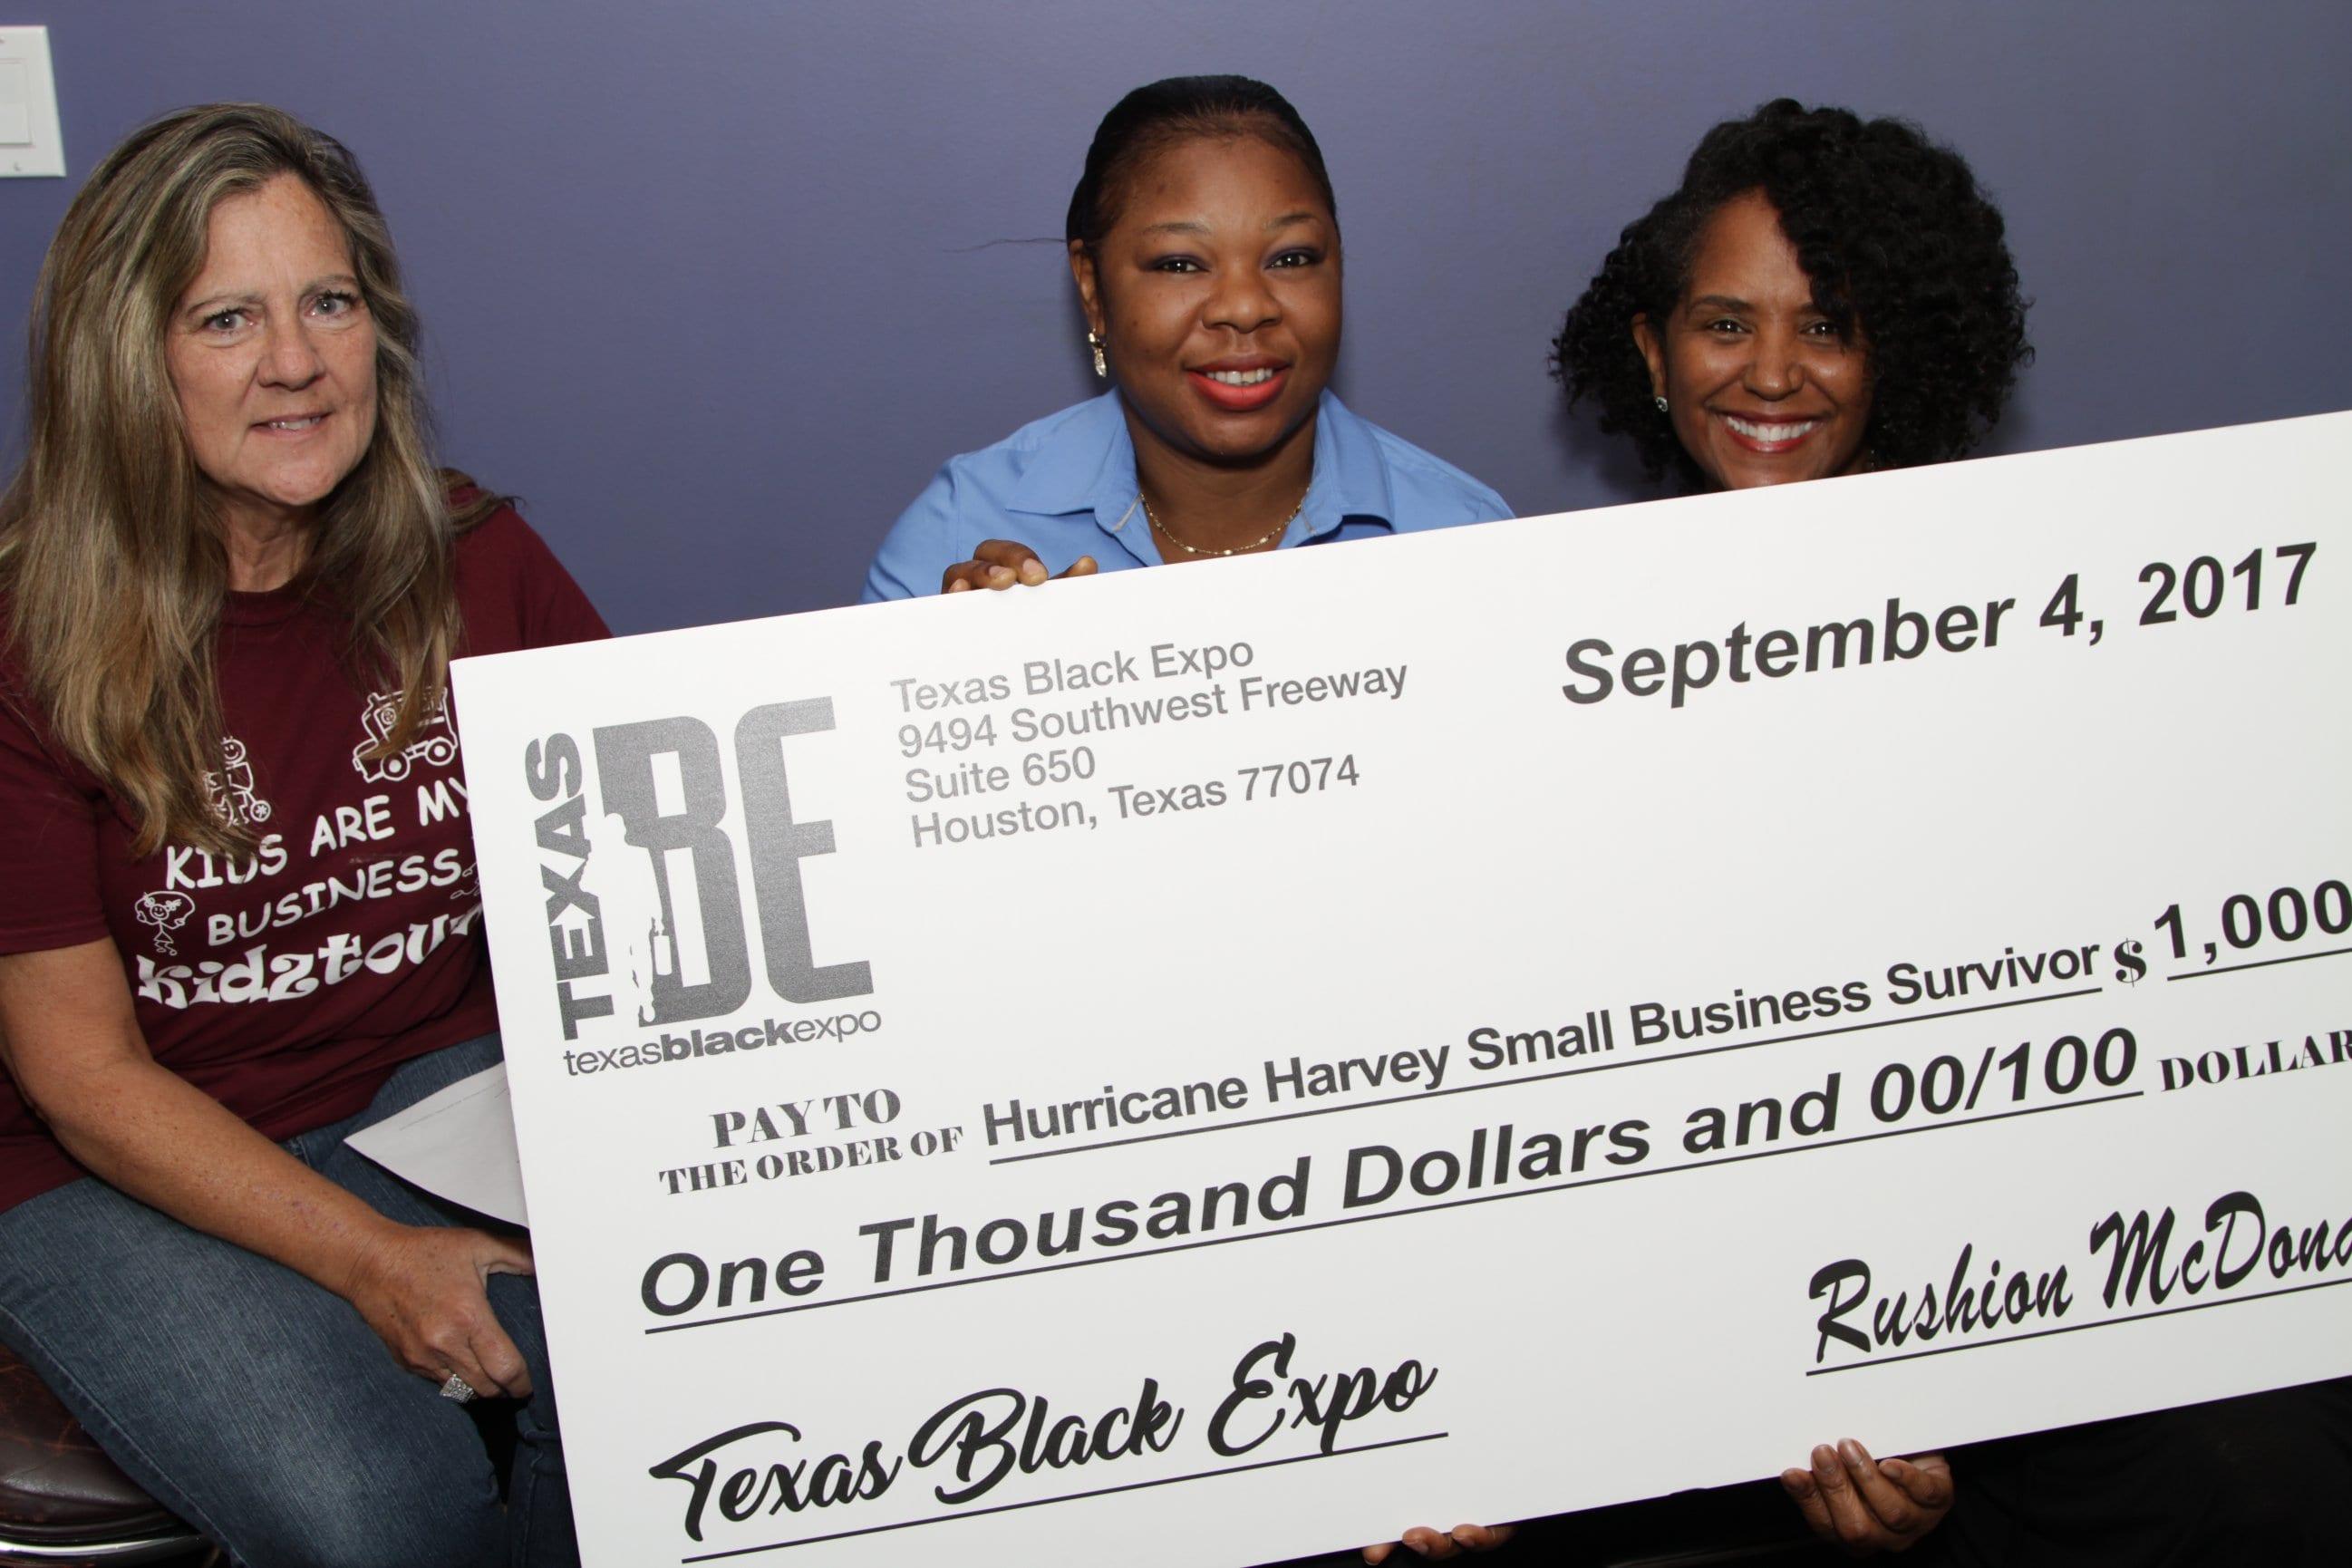 TSBEMS – Texas Black Expo